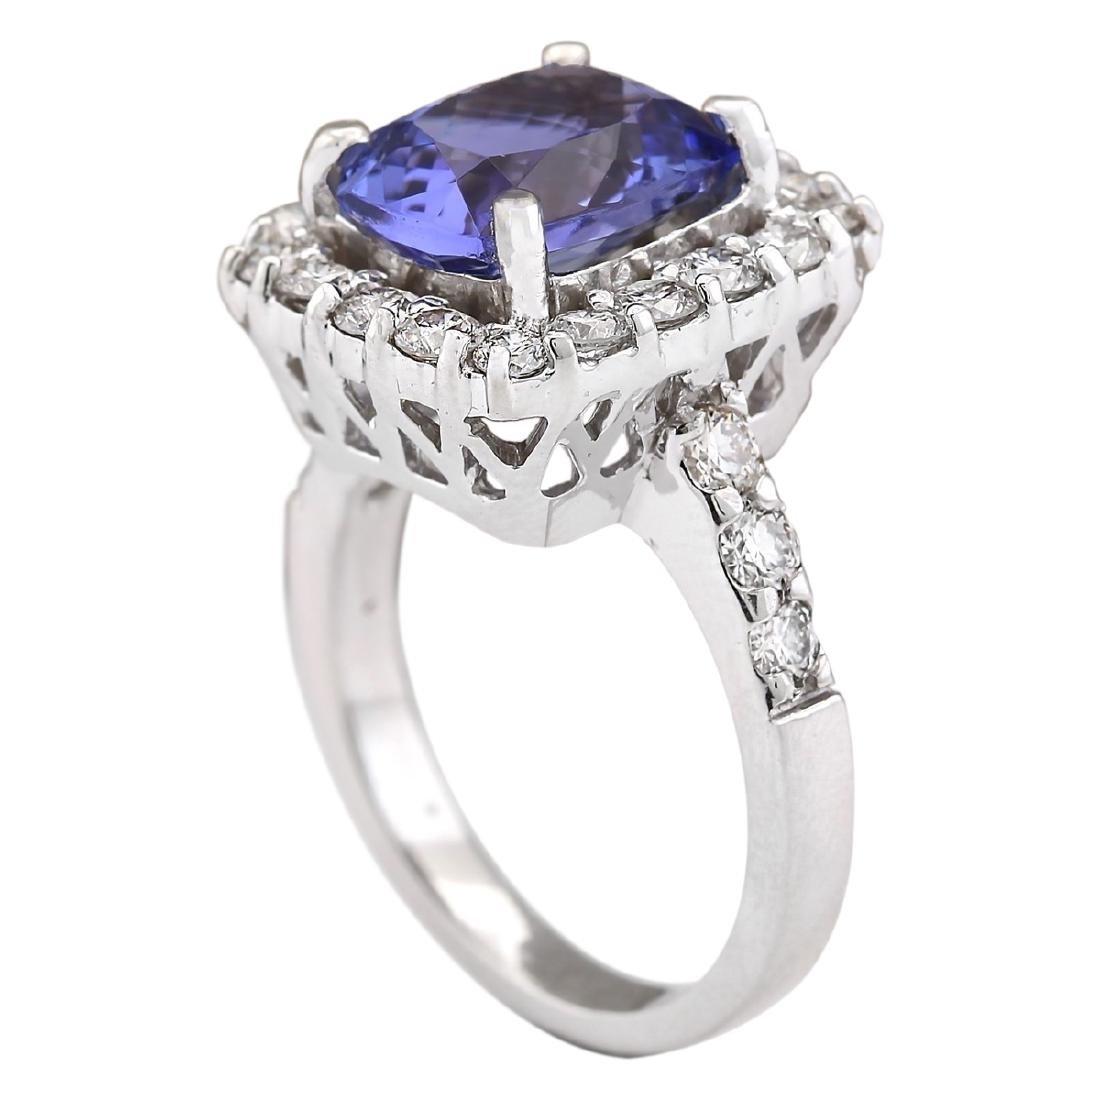 4.95 CTW Natural Blue Tanzanite And Diamond Ring 18K - 3